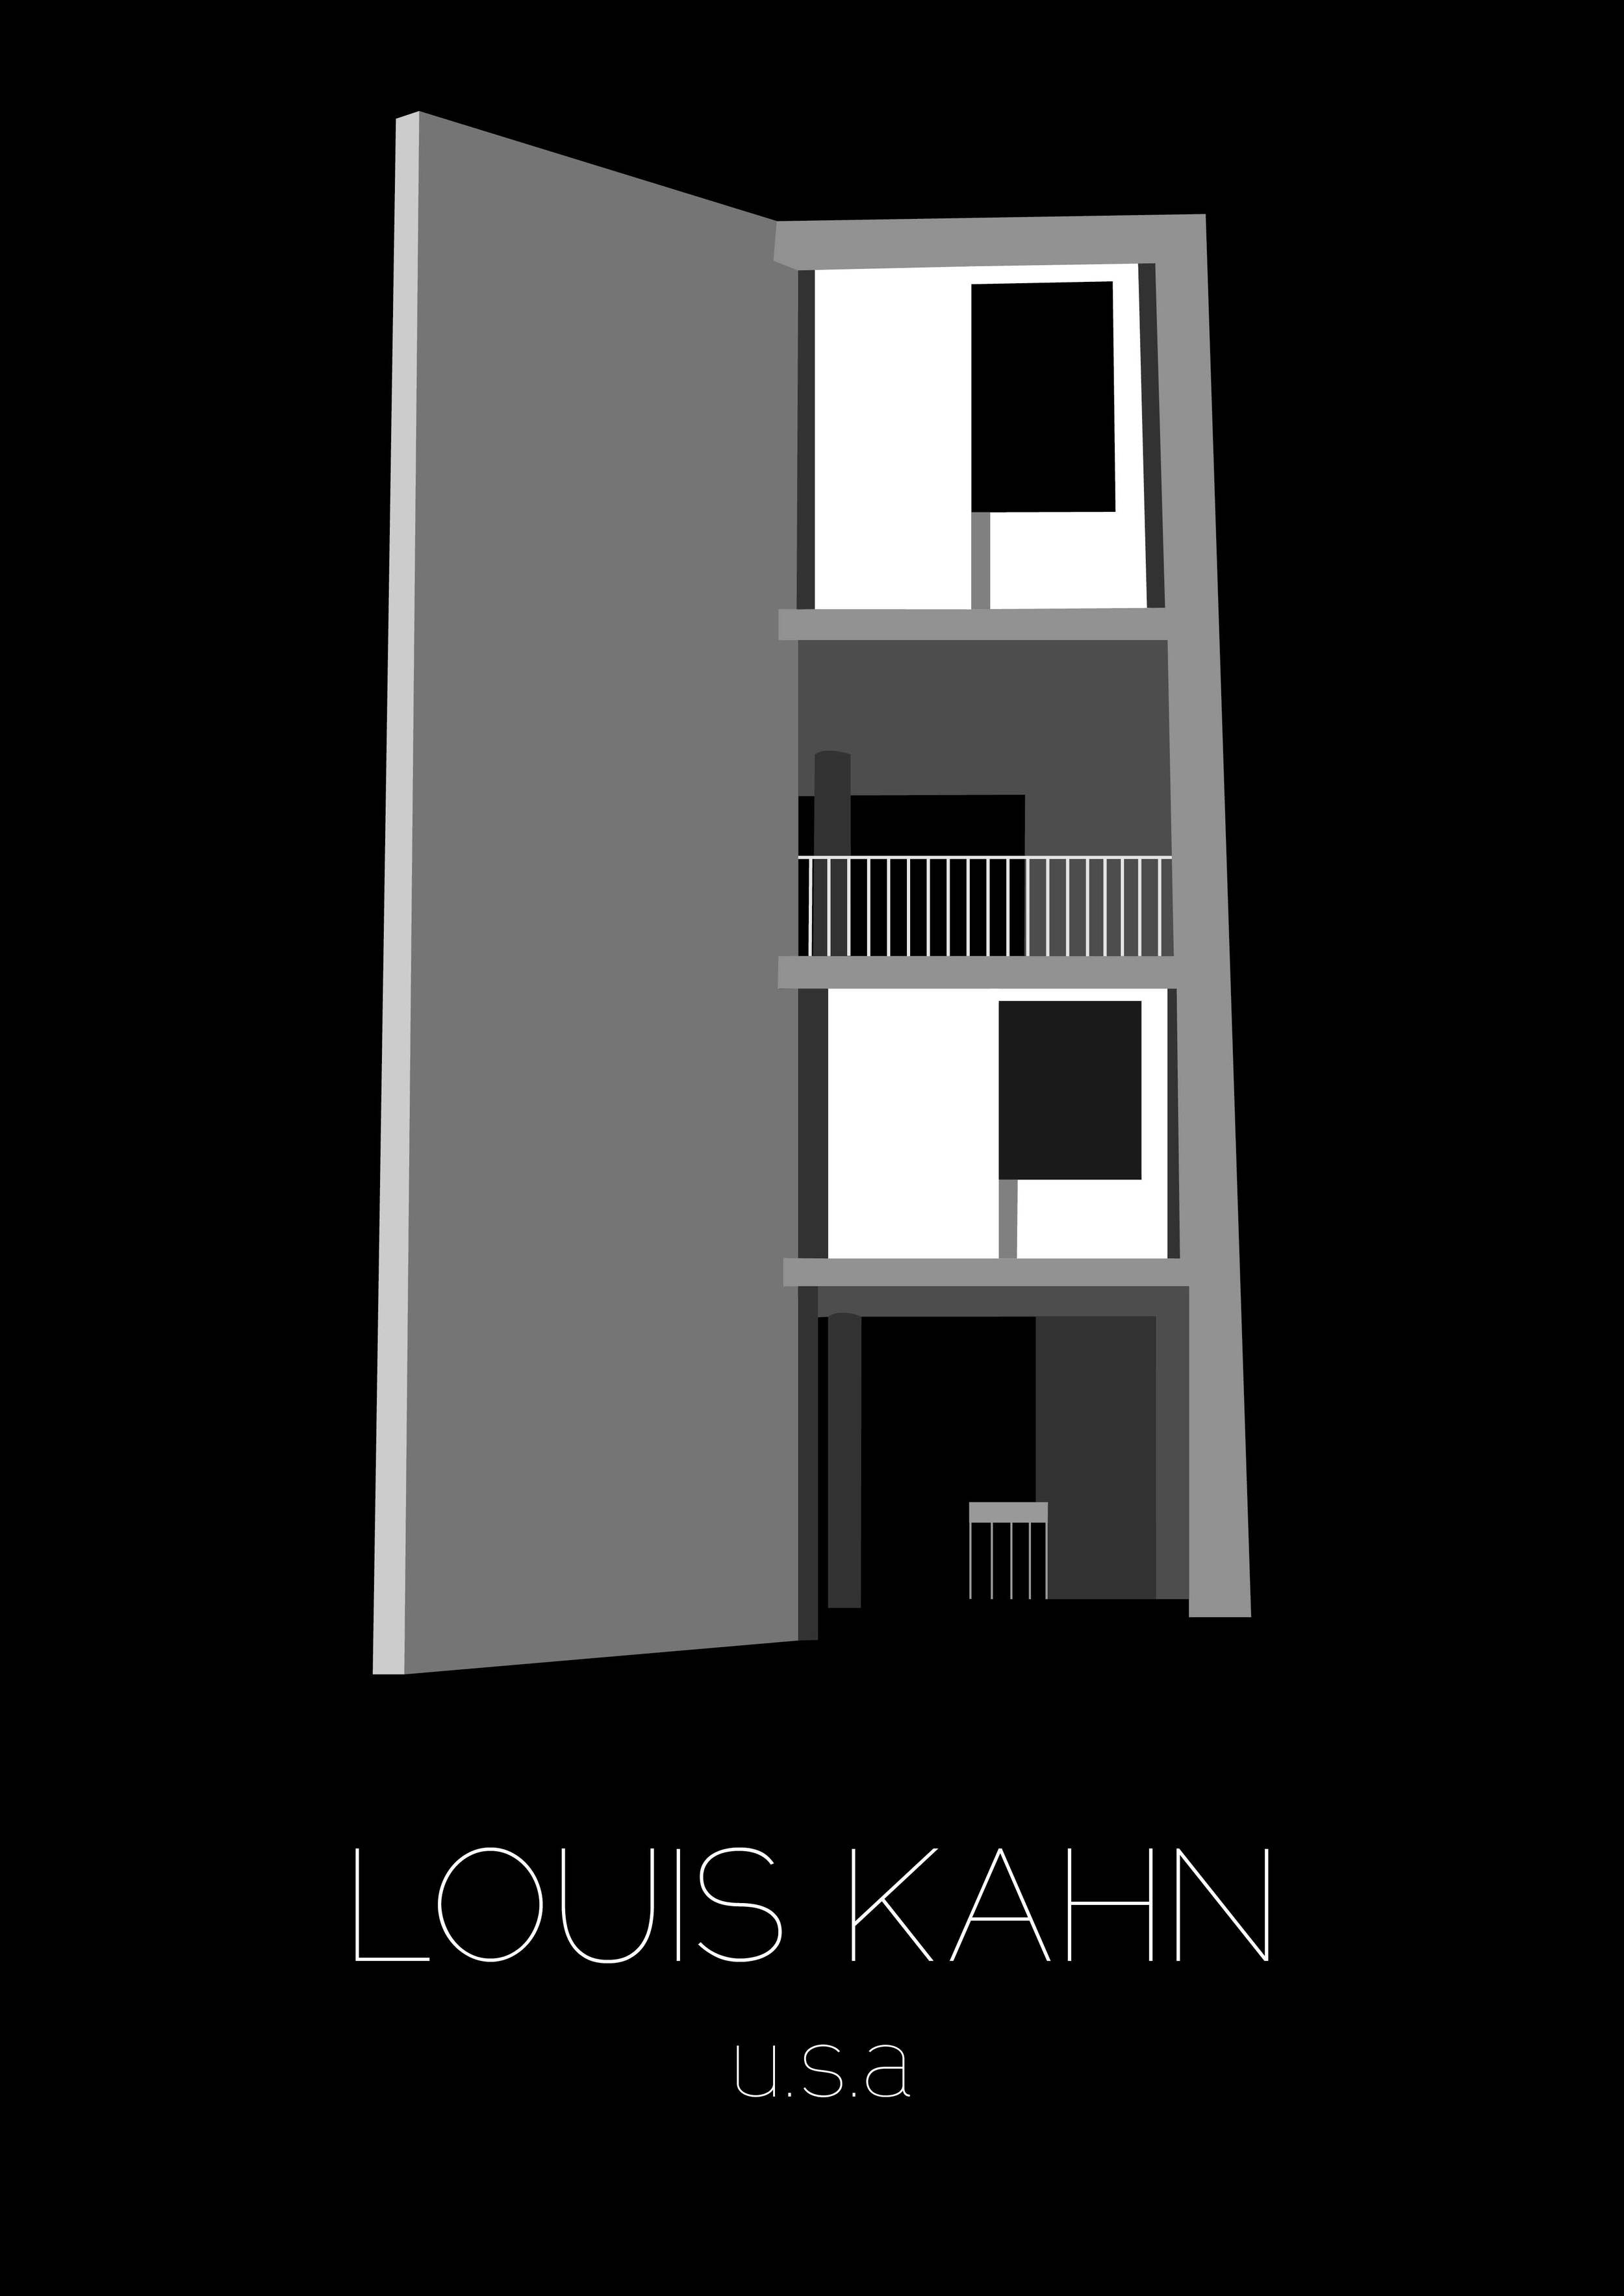 Poster d'architecture, Louis Kahn - www.marionchibrard.com   please do not remove images credits